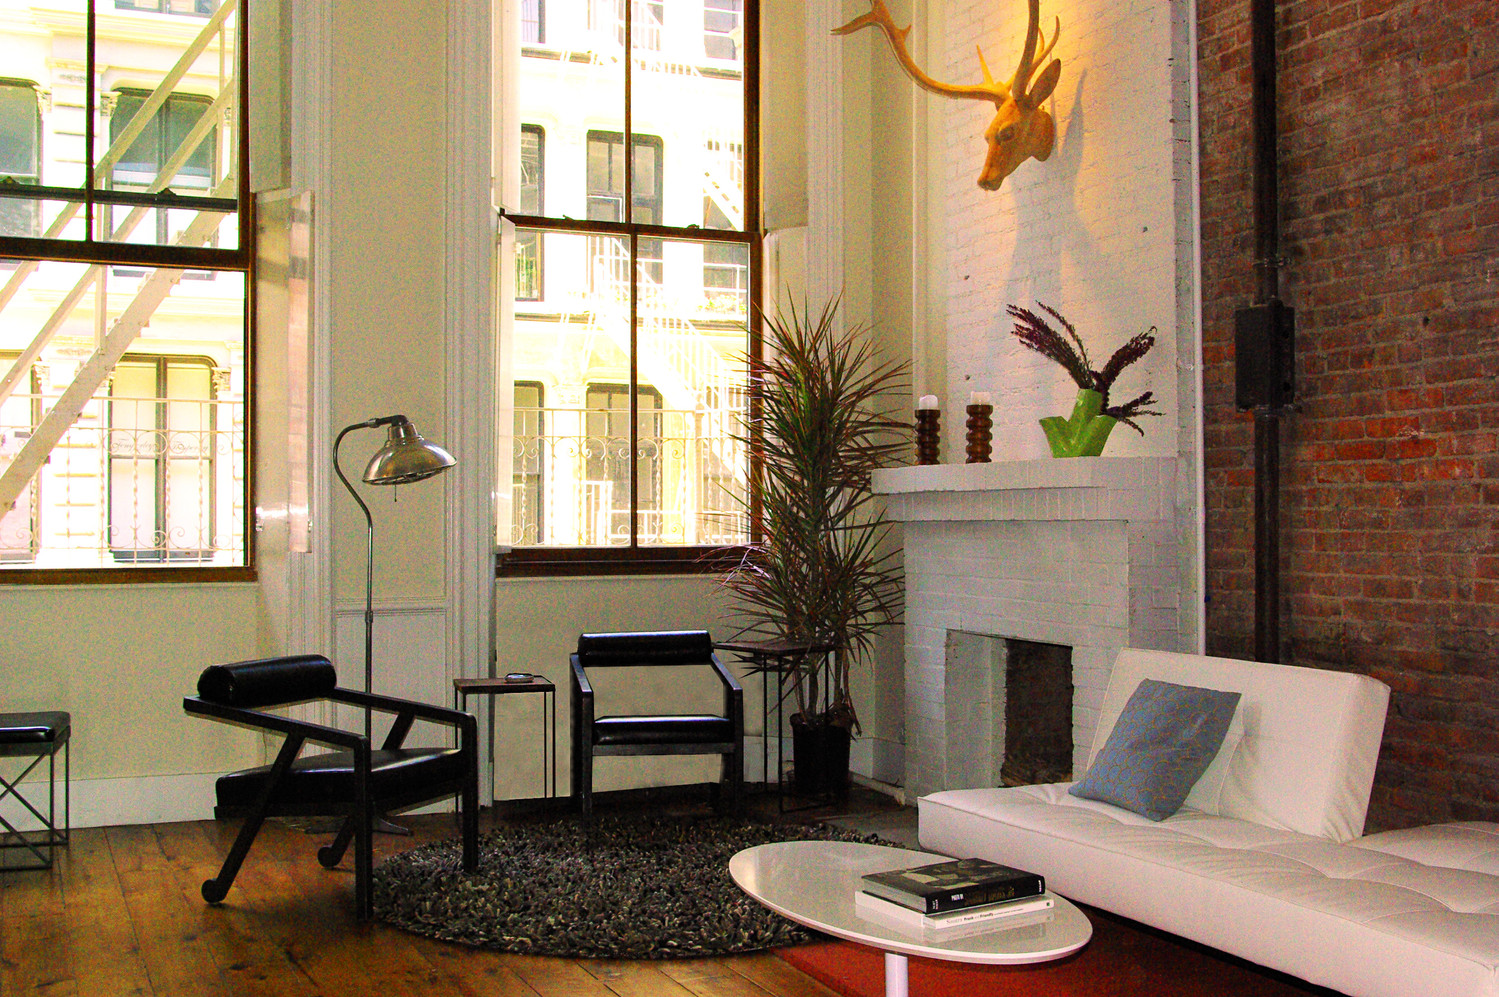 2 fireplace.jpg